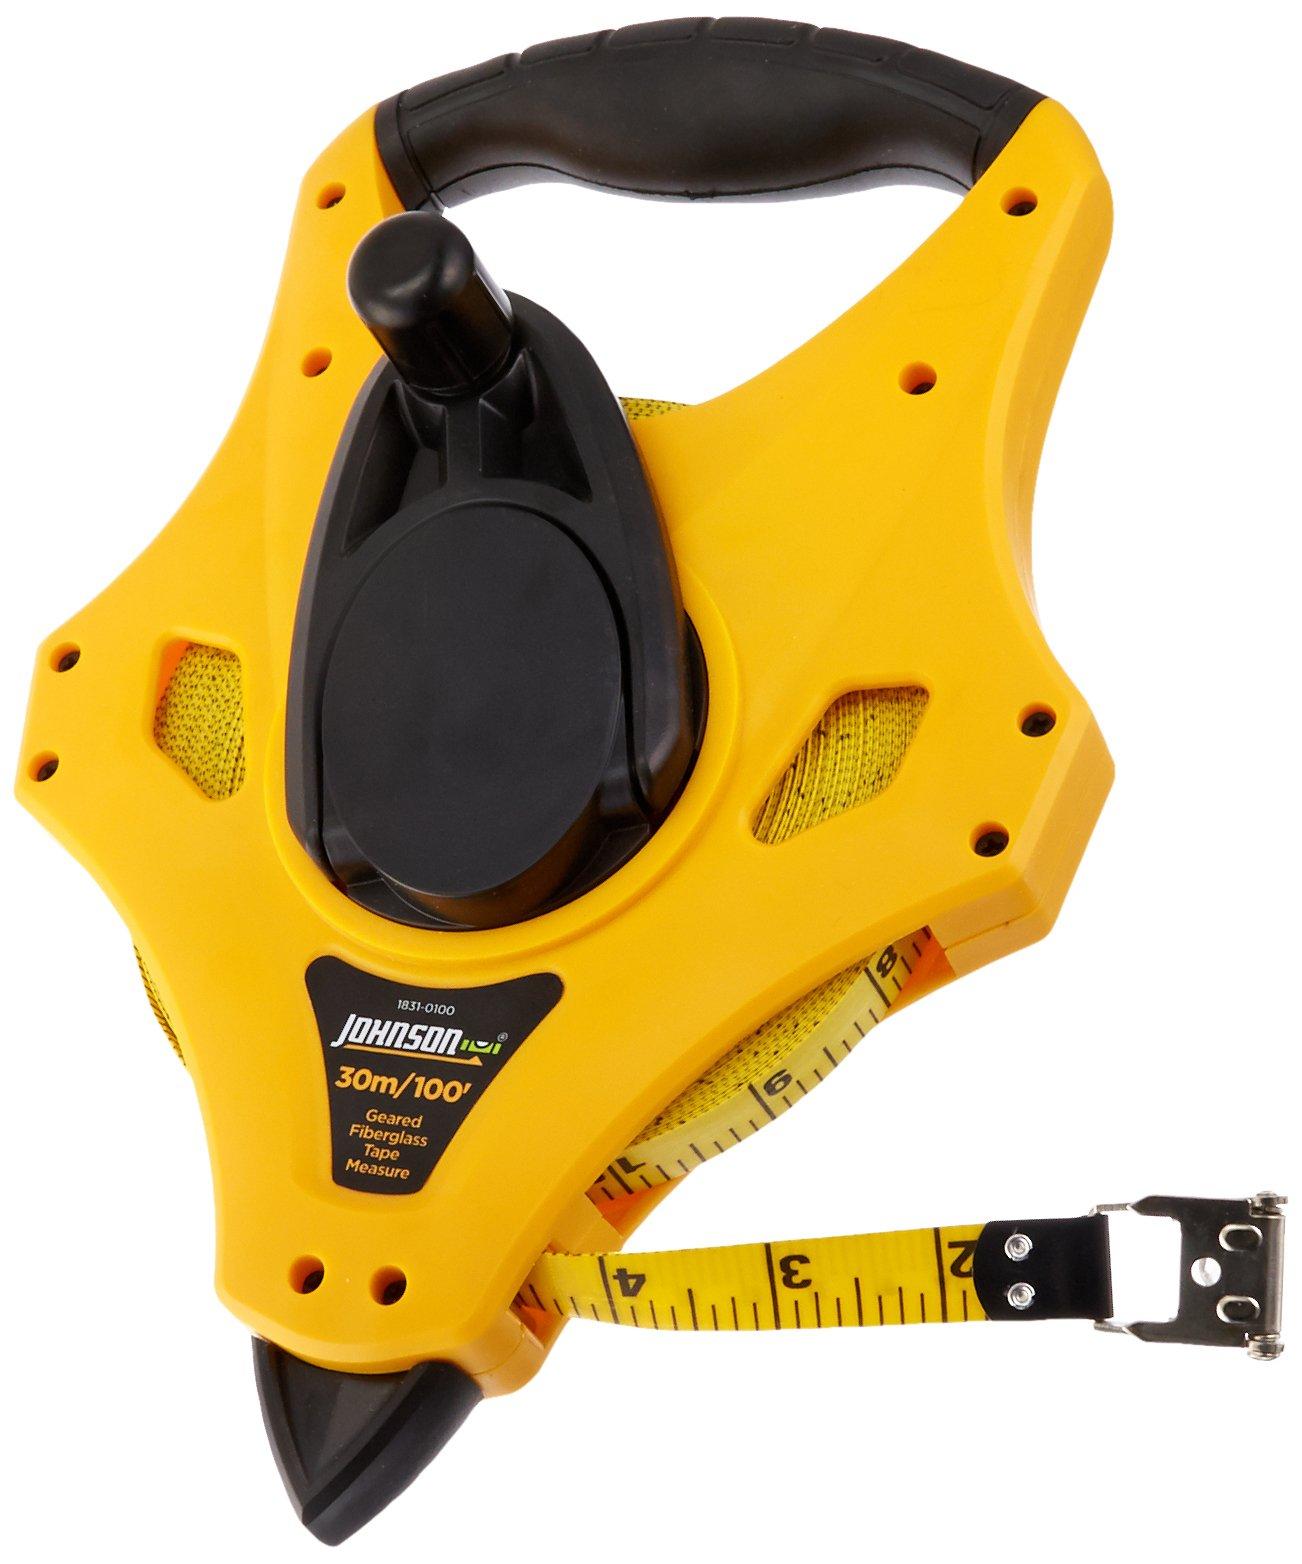 Johnson Level & Tool 1831-0100 Long Tape Measure Geared Metric, 100-Feet